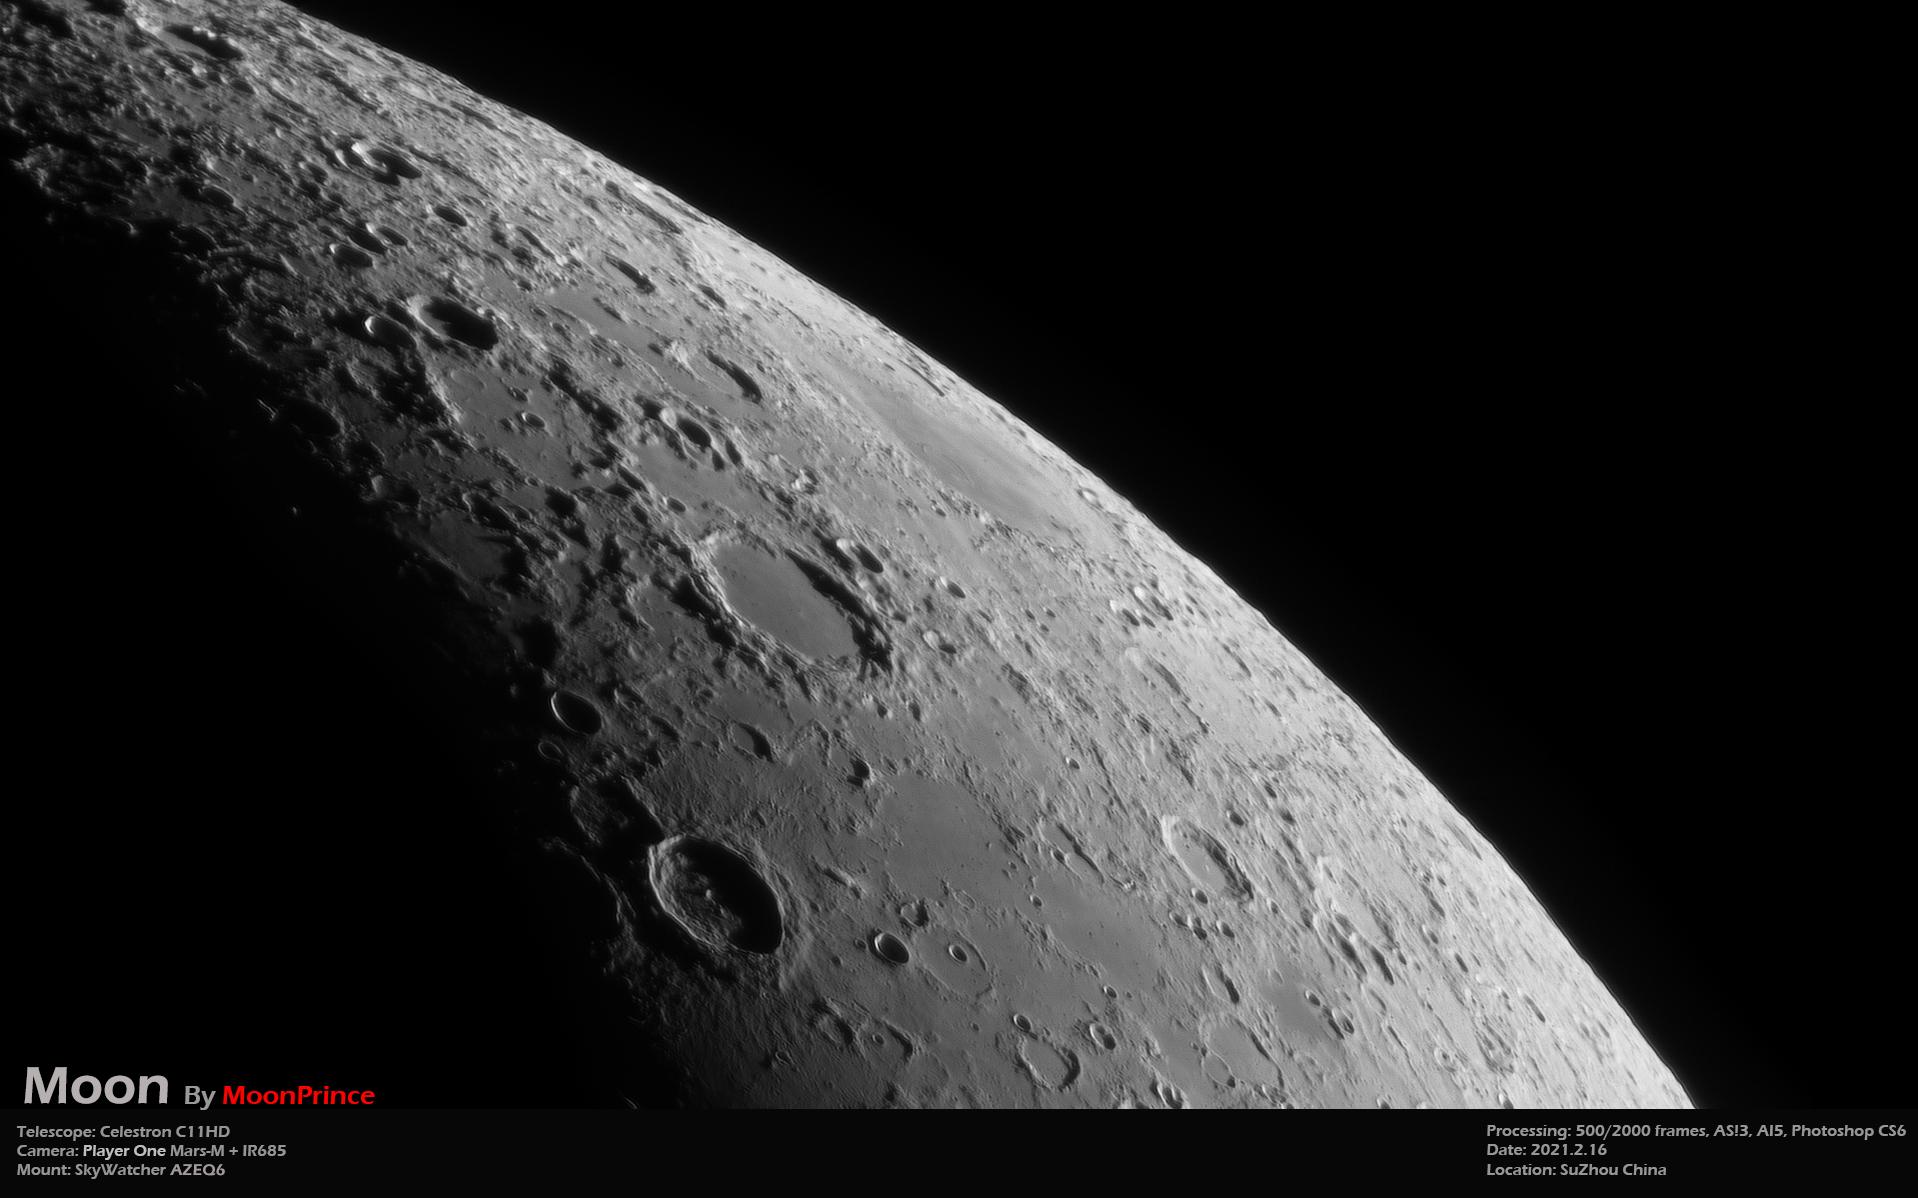 Moon20210216-S2.jpg